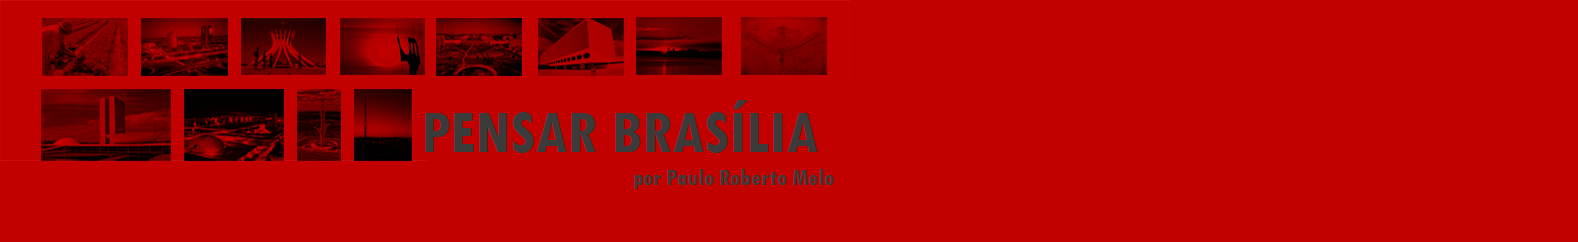 PENSAR Brasília